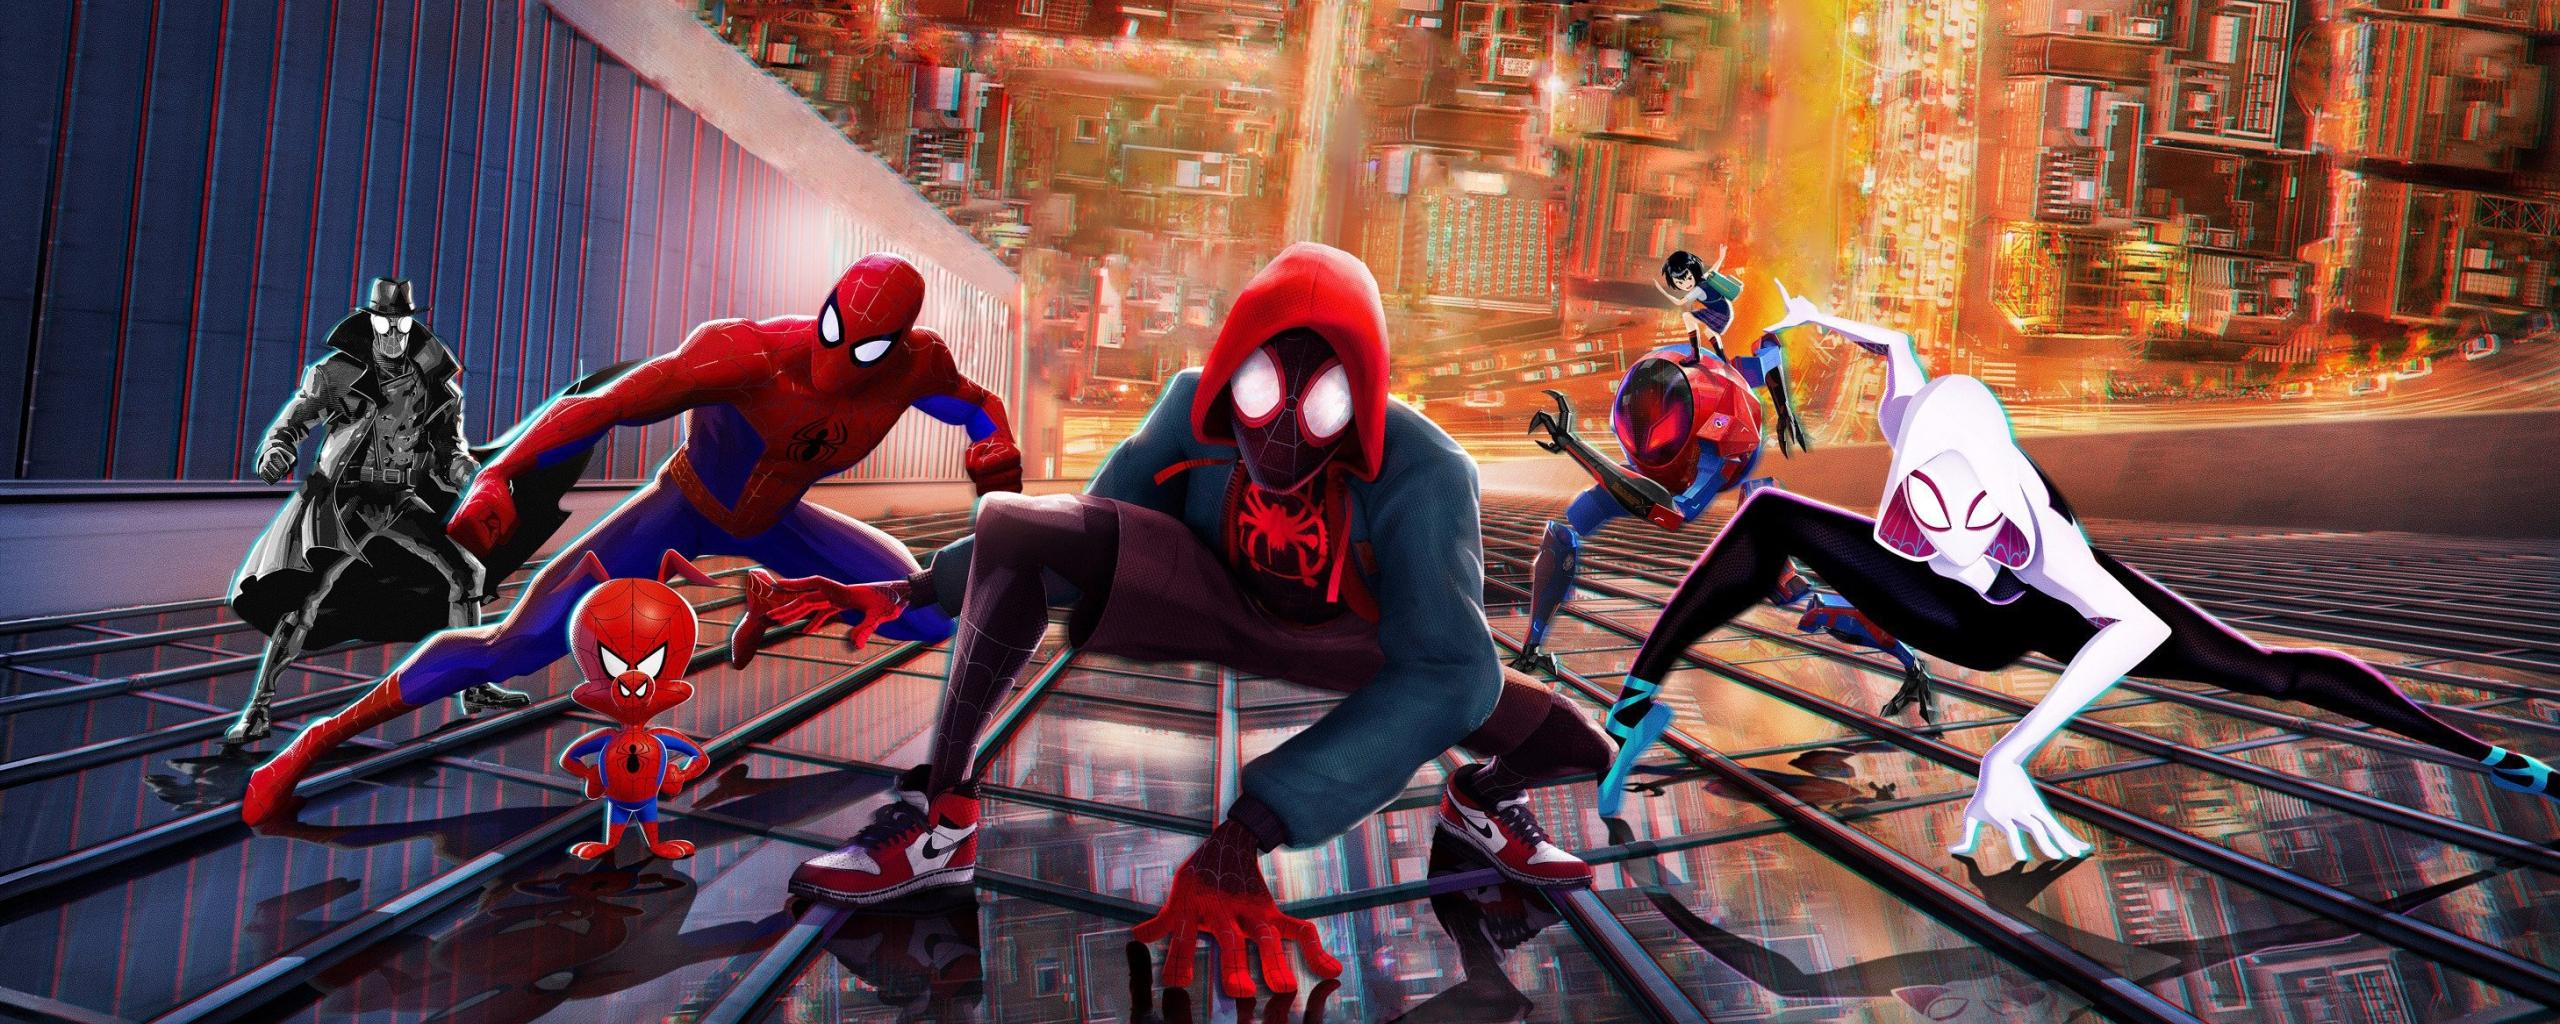 2560x1024 spiderman into the spiderverse 2018 movie